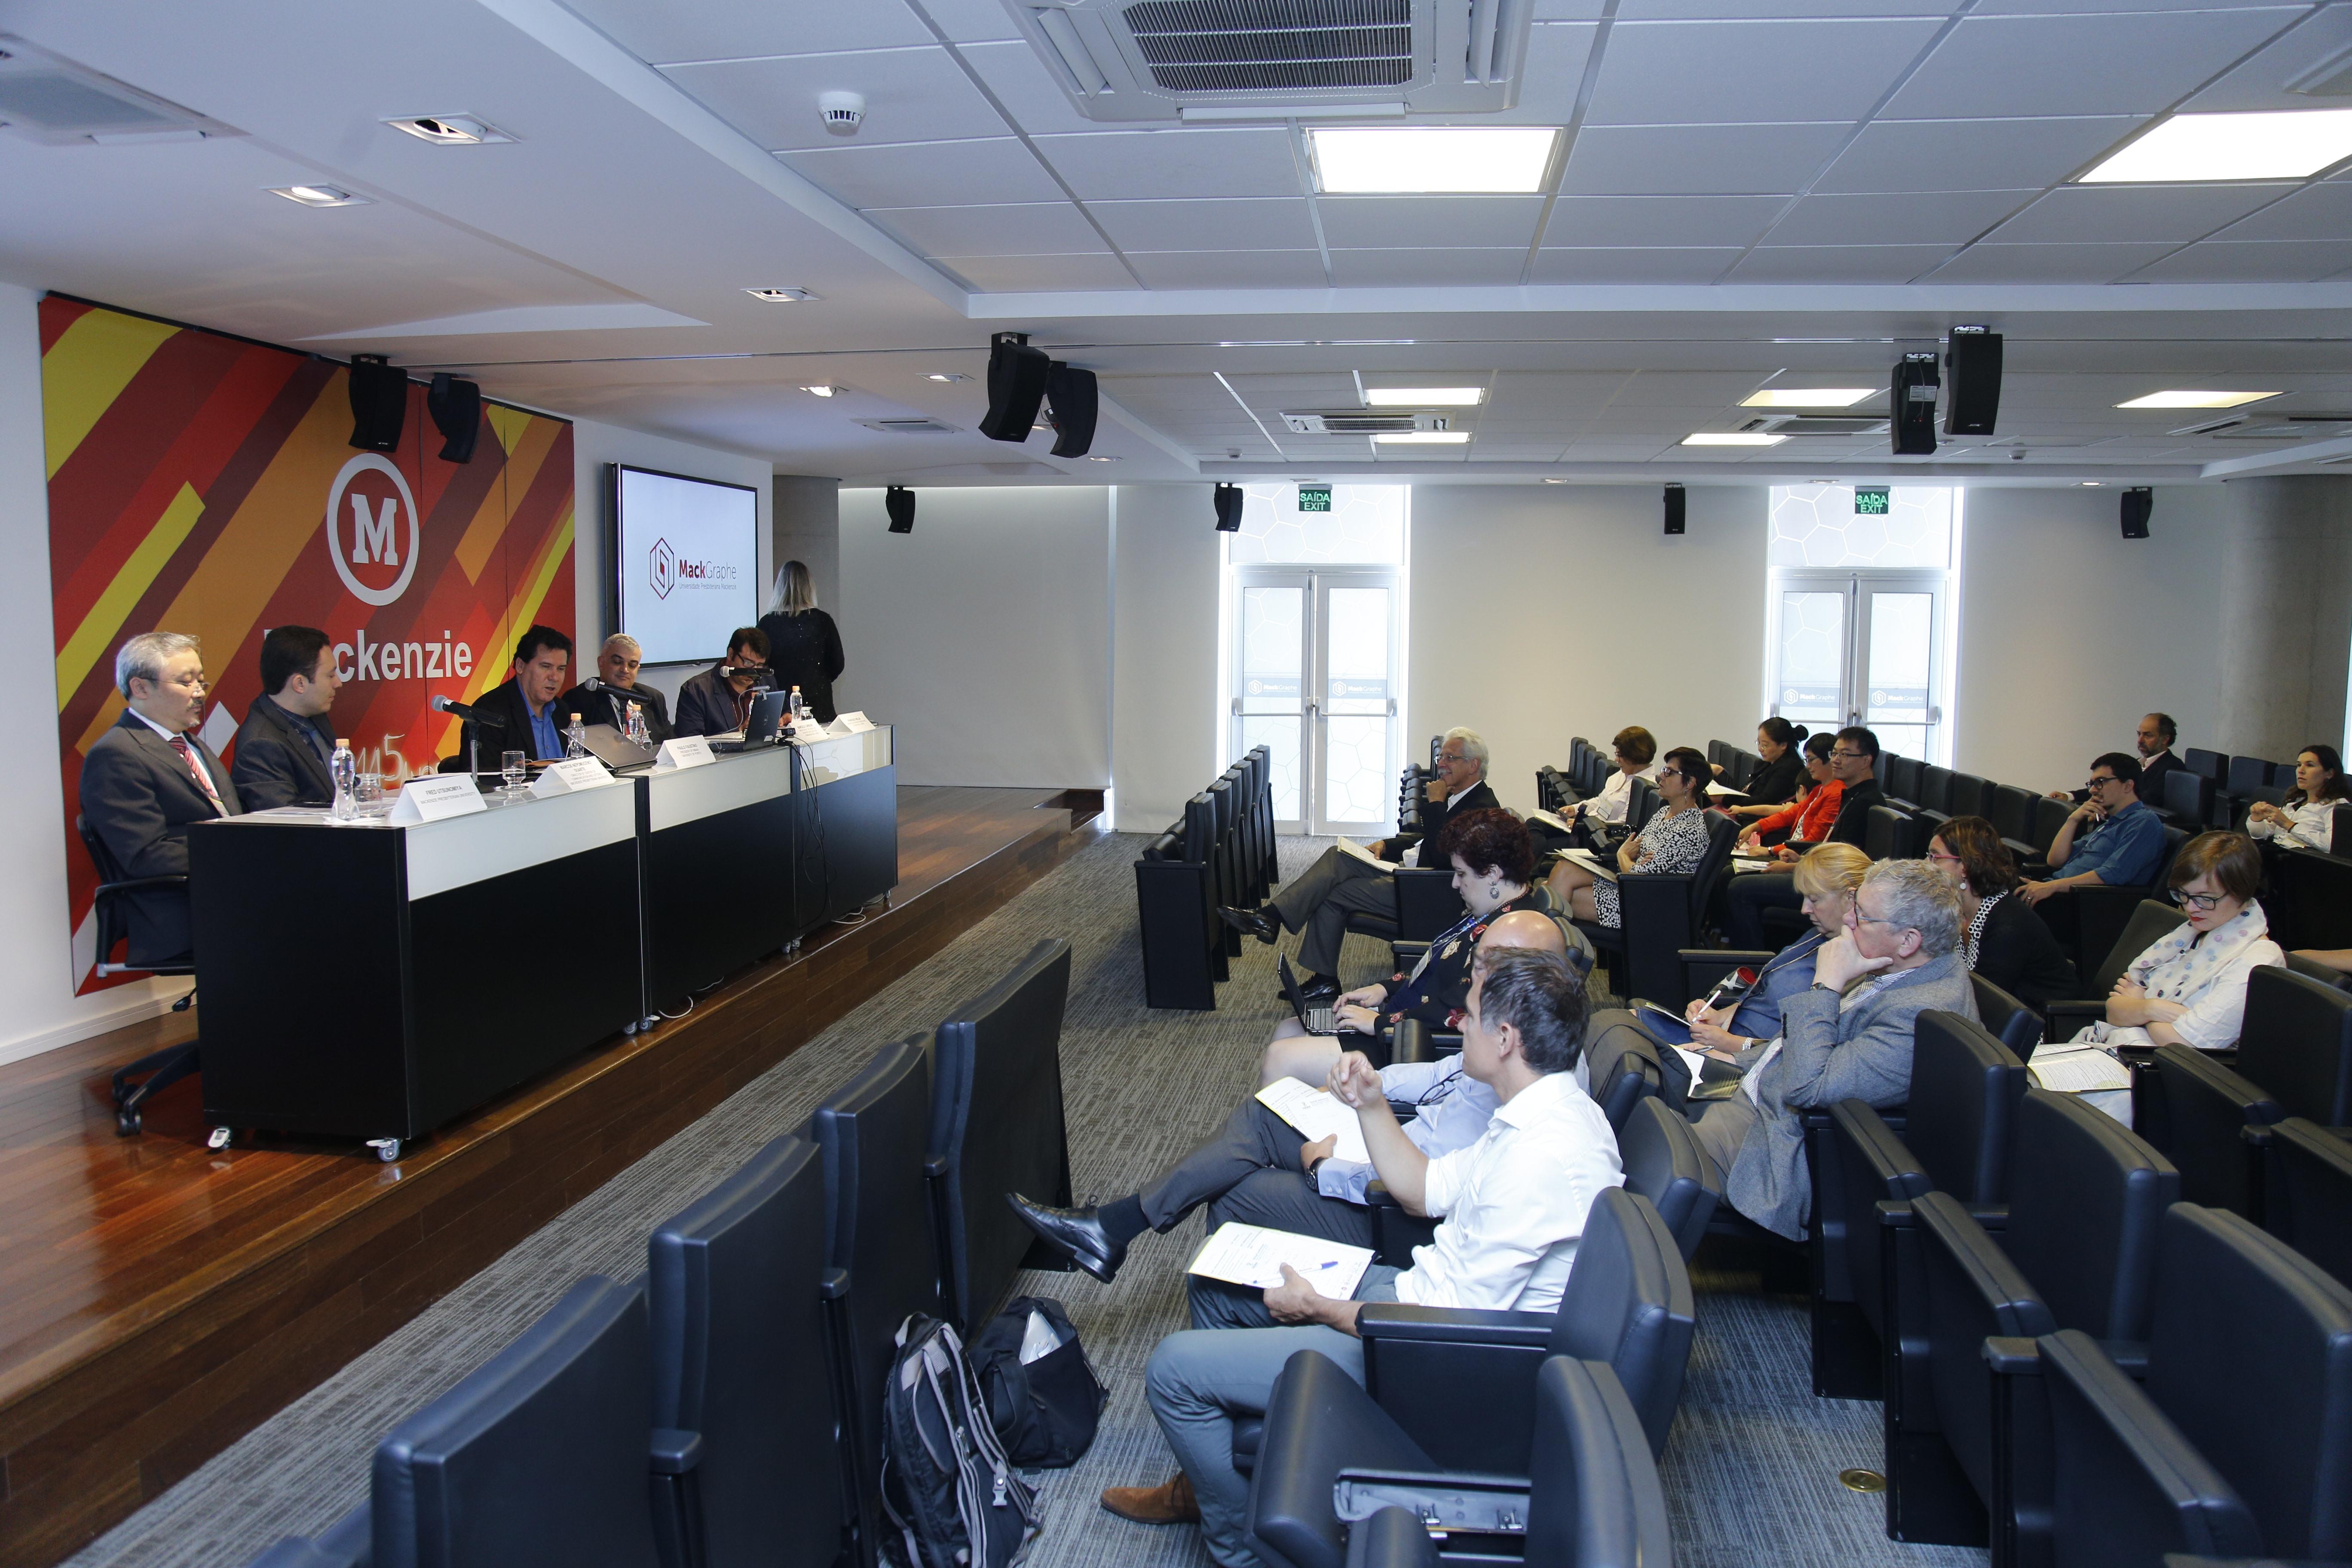 IMMA São Paulo Conference